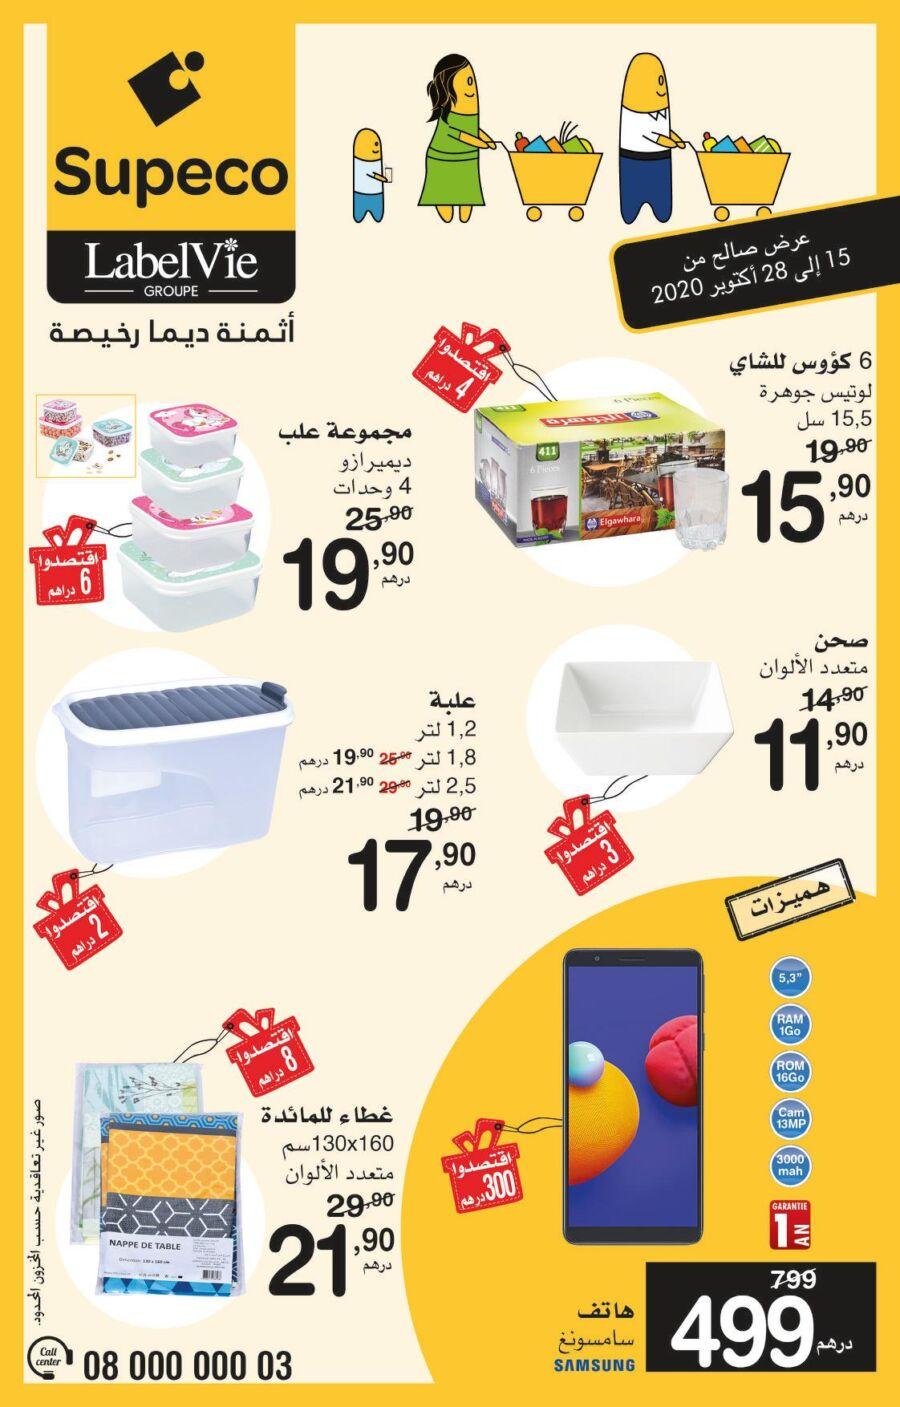 Catalogue Supeco Maroc أثمنة ديما رخيصة du 15 au 28 octobre 2020